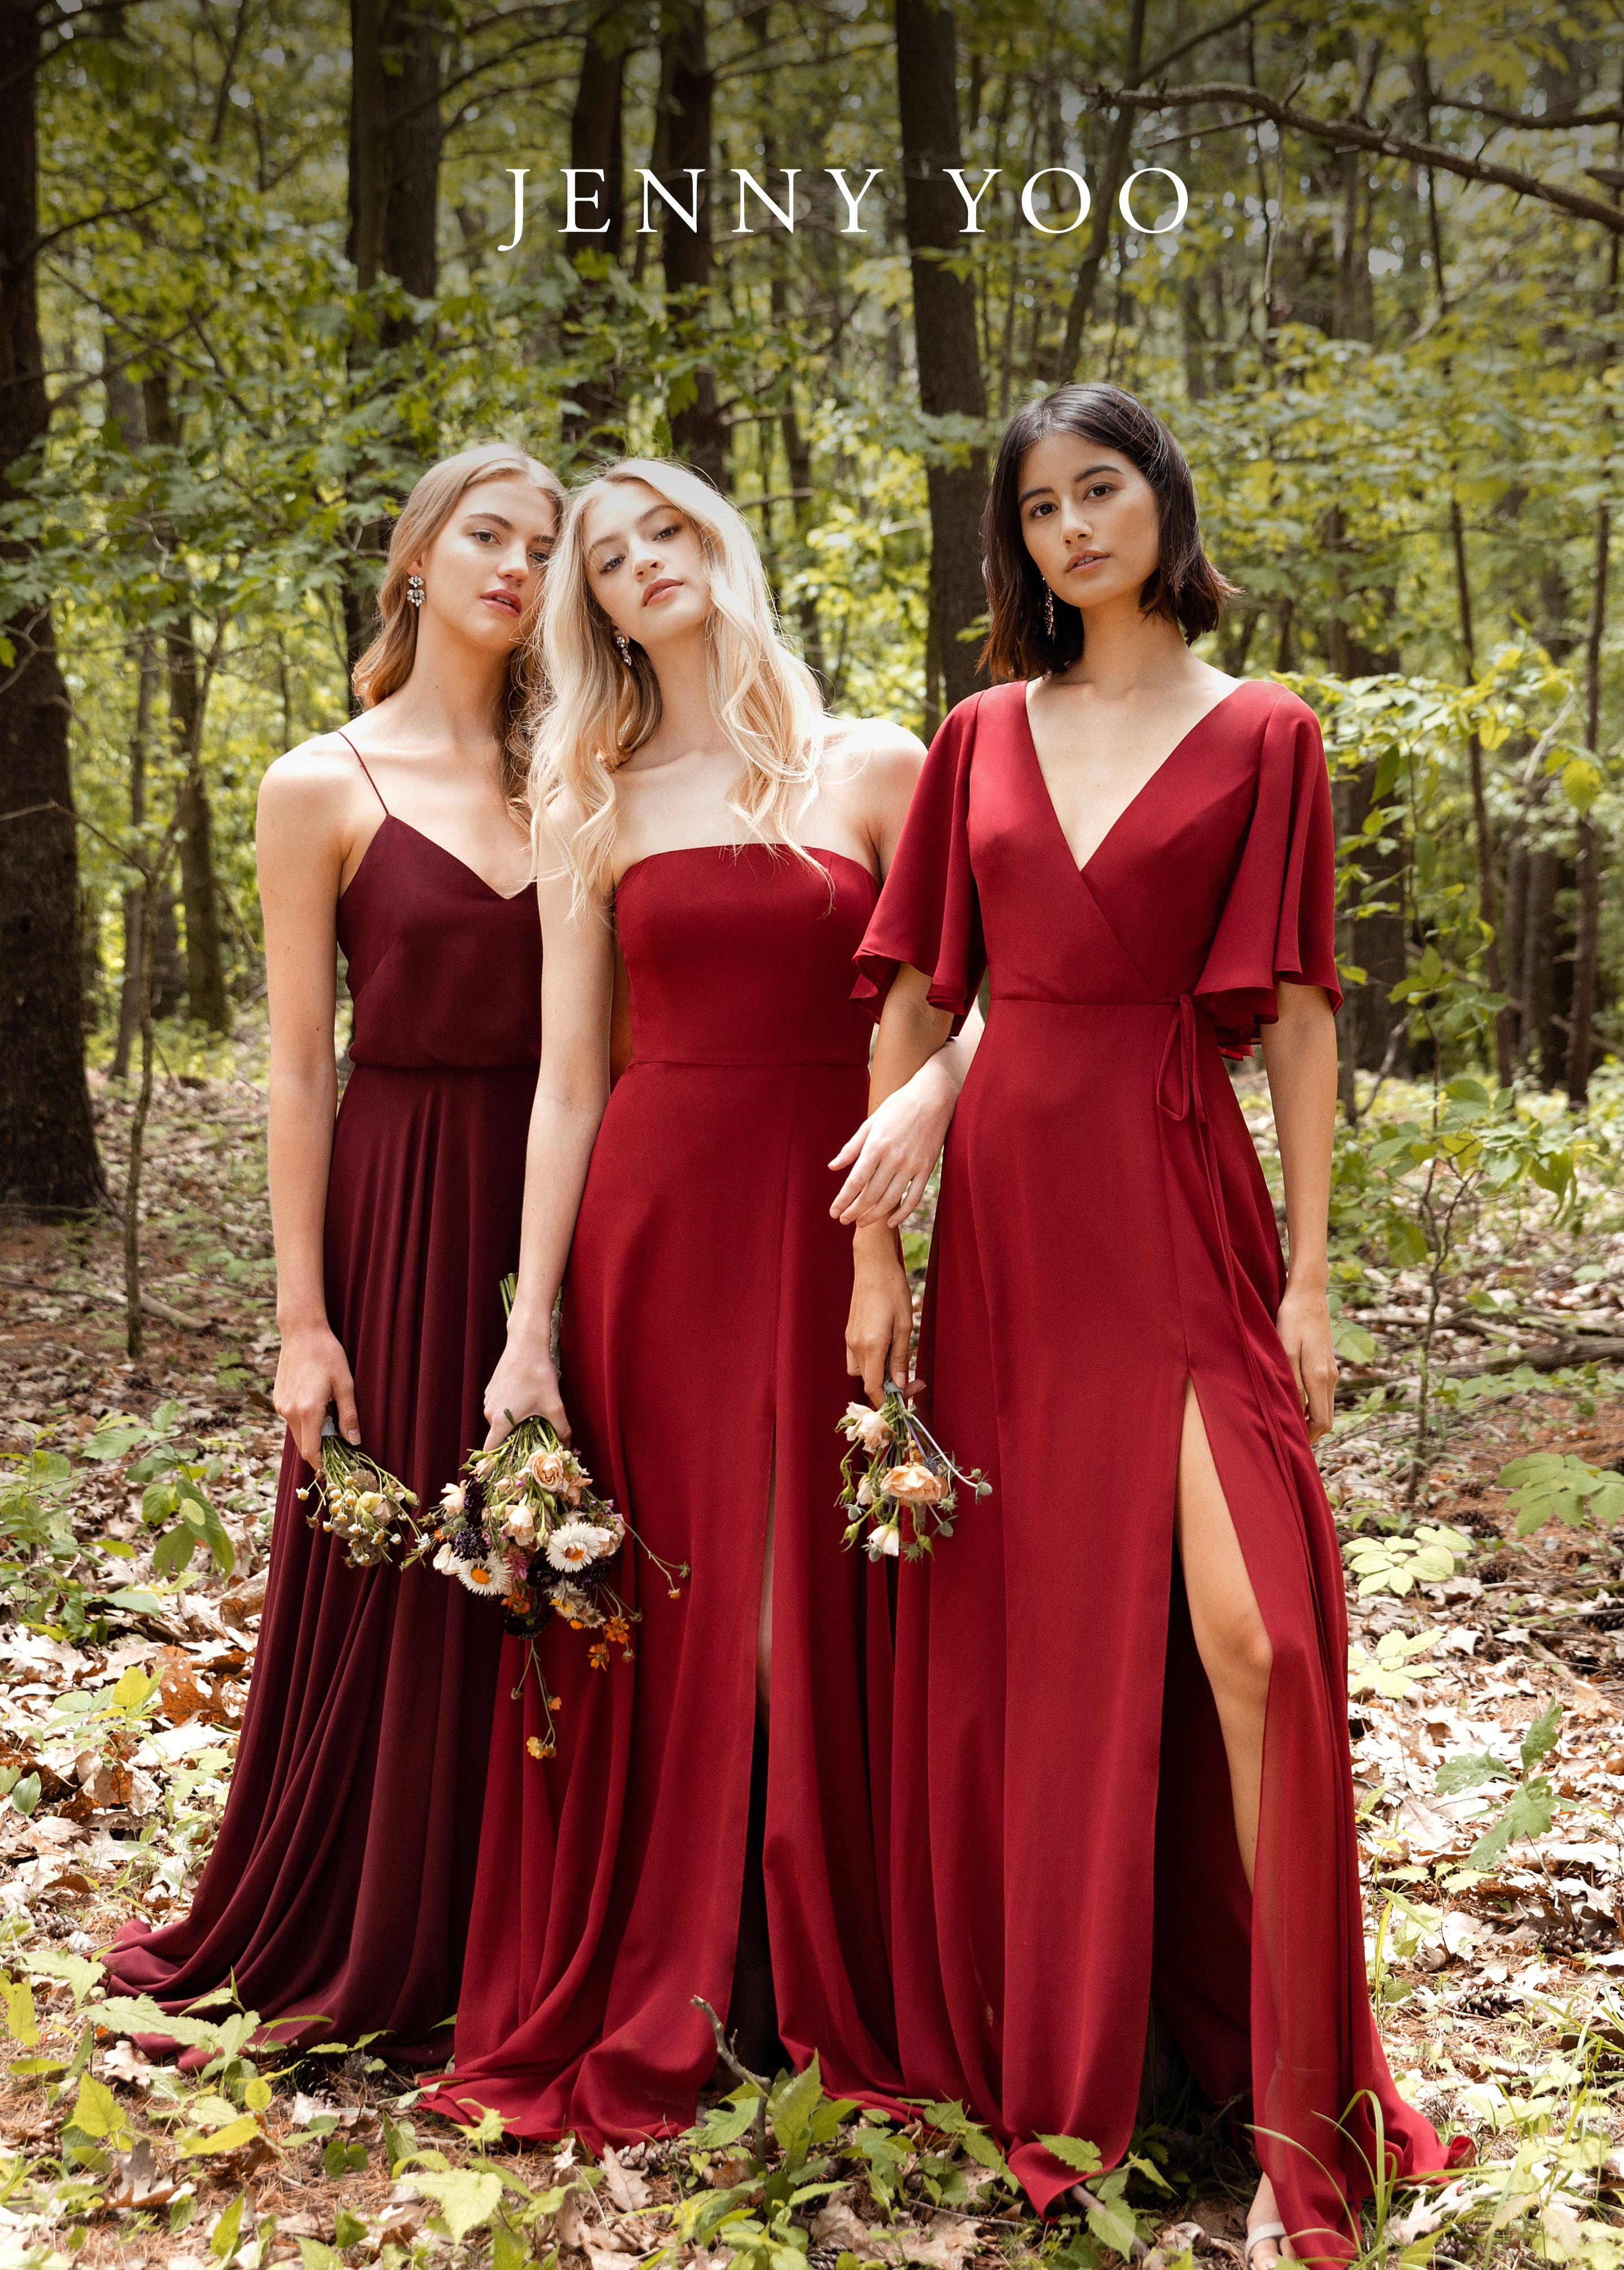 Burgundy Fall Bridesmaids Dresses Bridesmaid Dresses Boho Bridesmaid Dresses Red Long Fall Bridesmaid Dresses